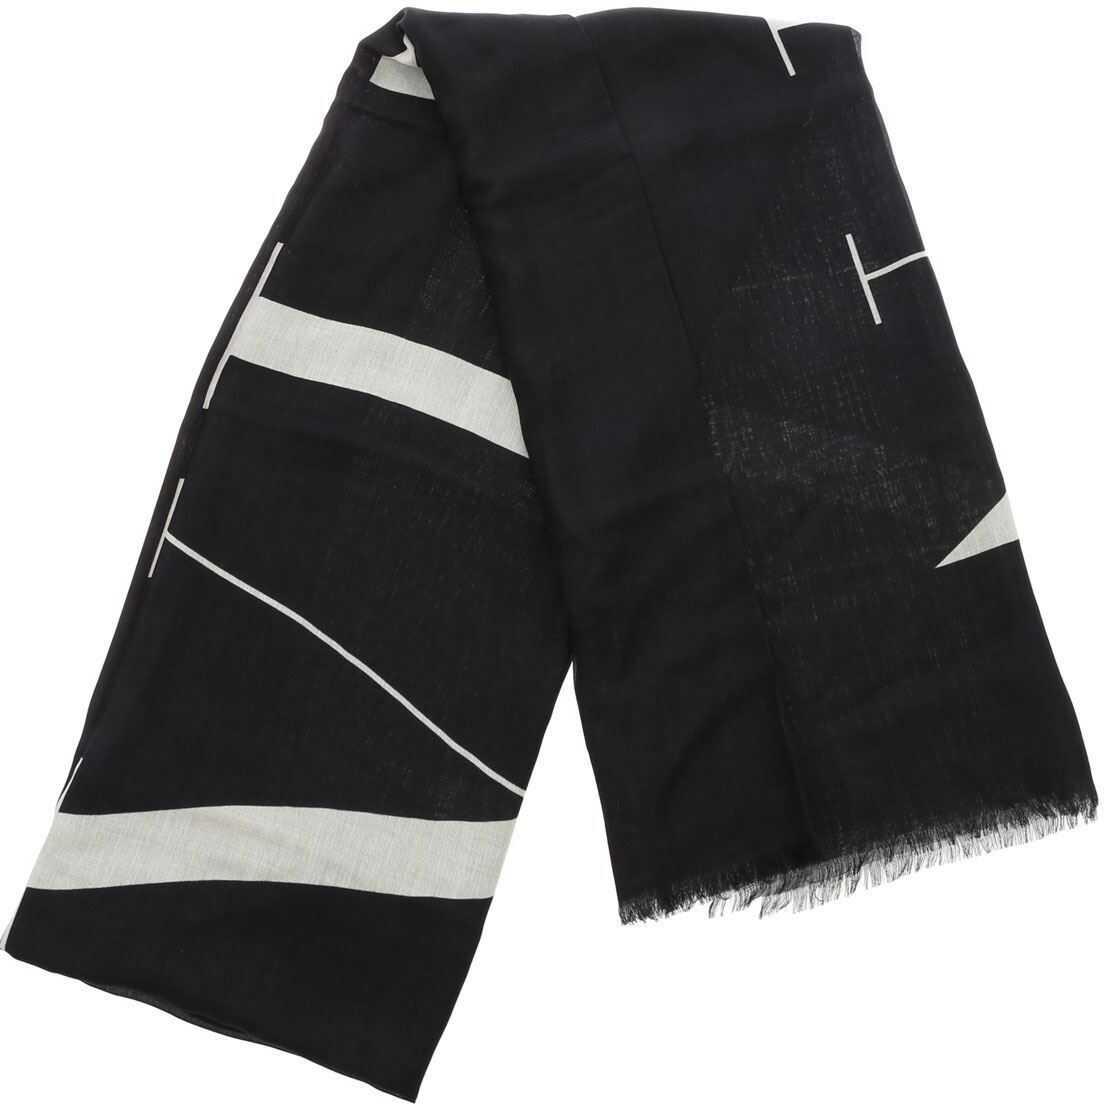 Valentino Garavani Vltn Modal And Cashmere Black Scarf Black